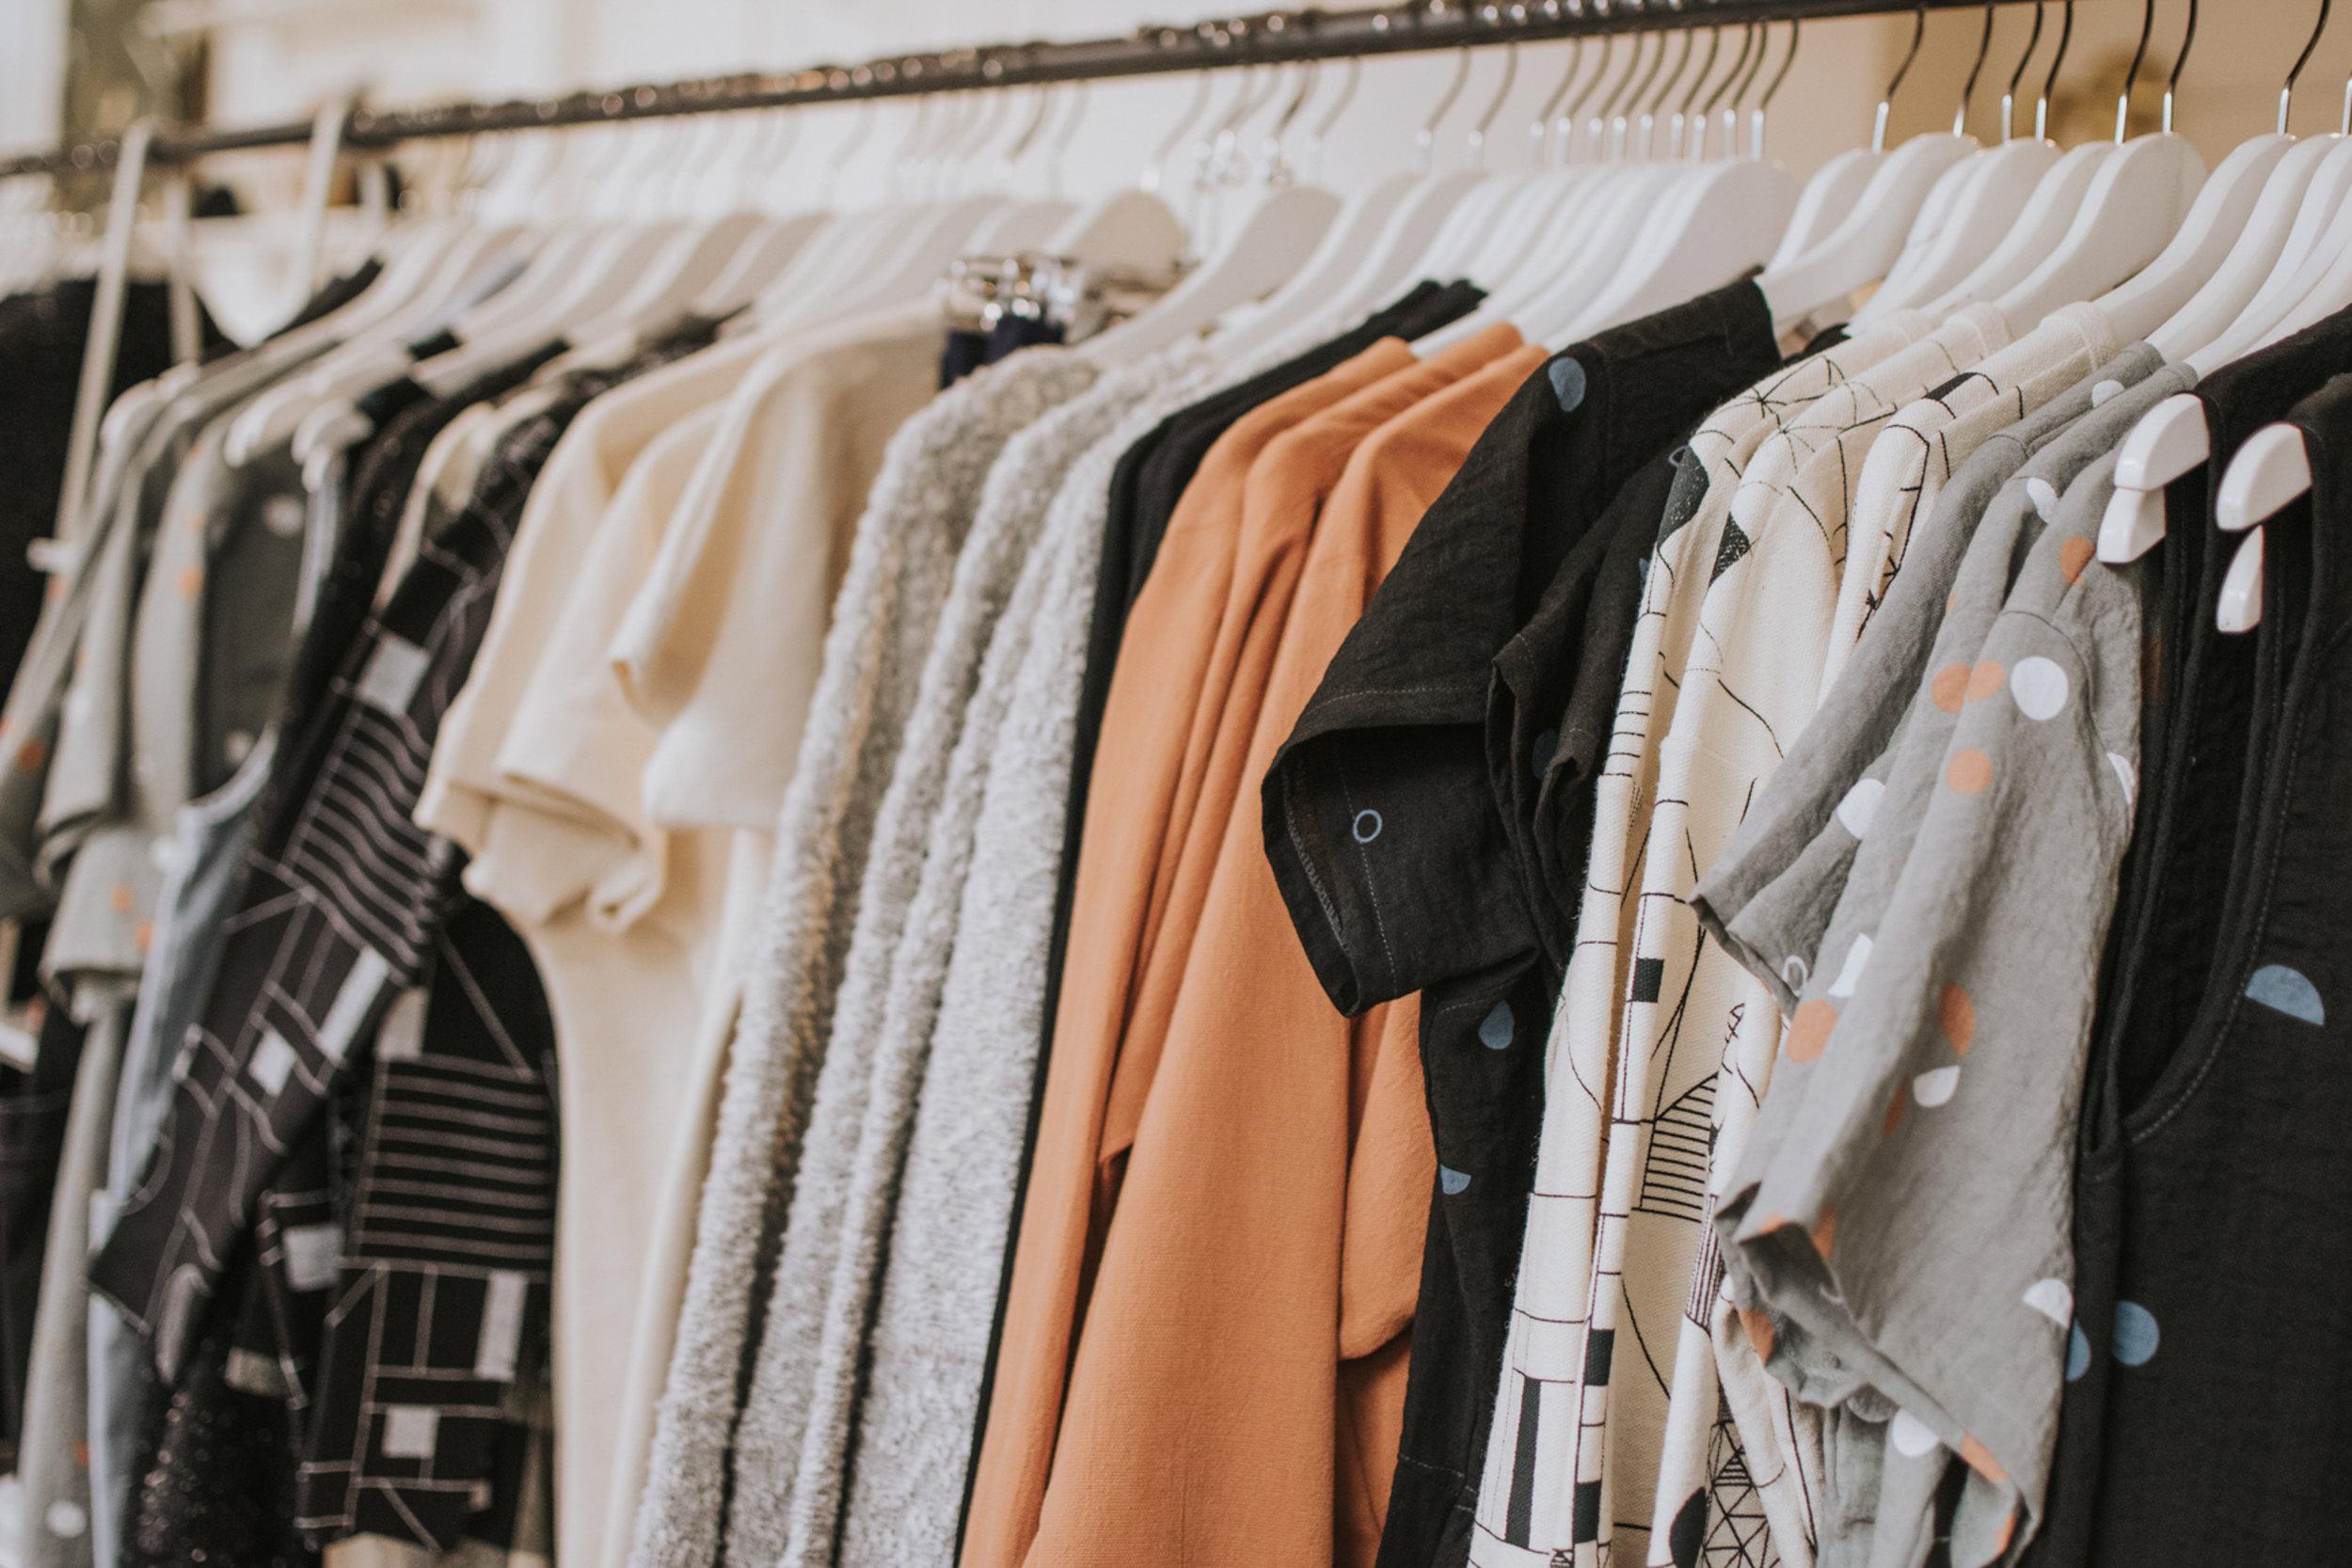 Fashion/Apparel -